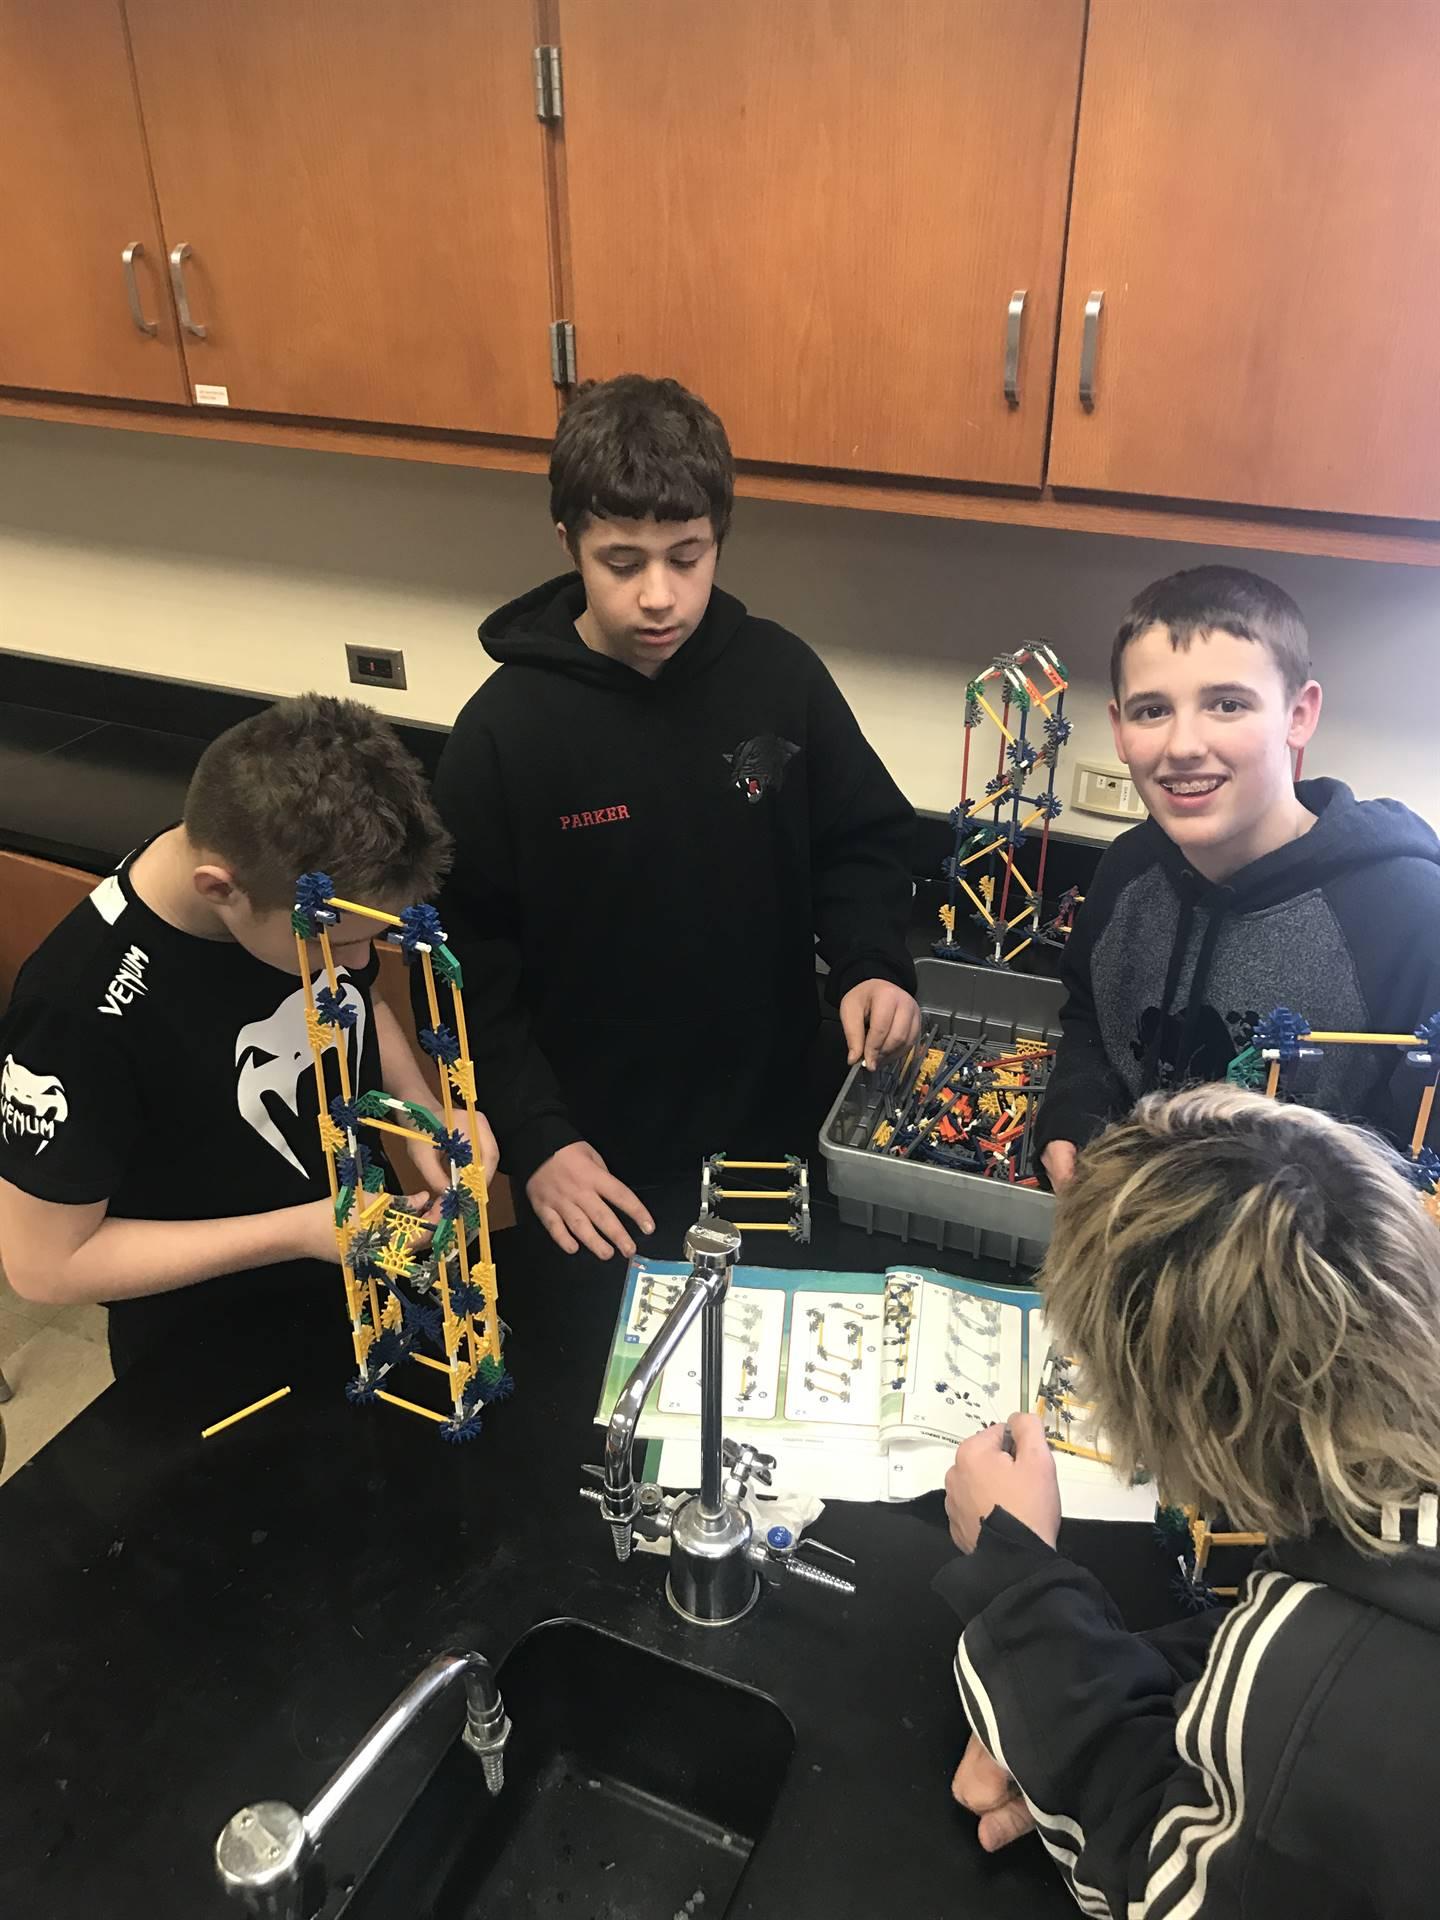 8th grade STEM students building with K'nex